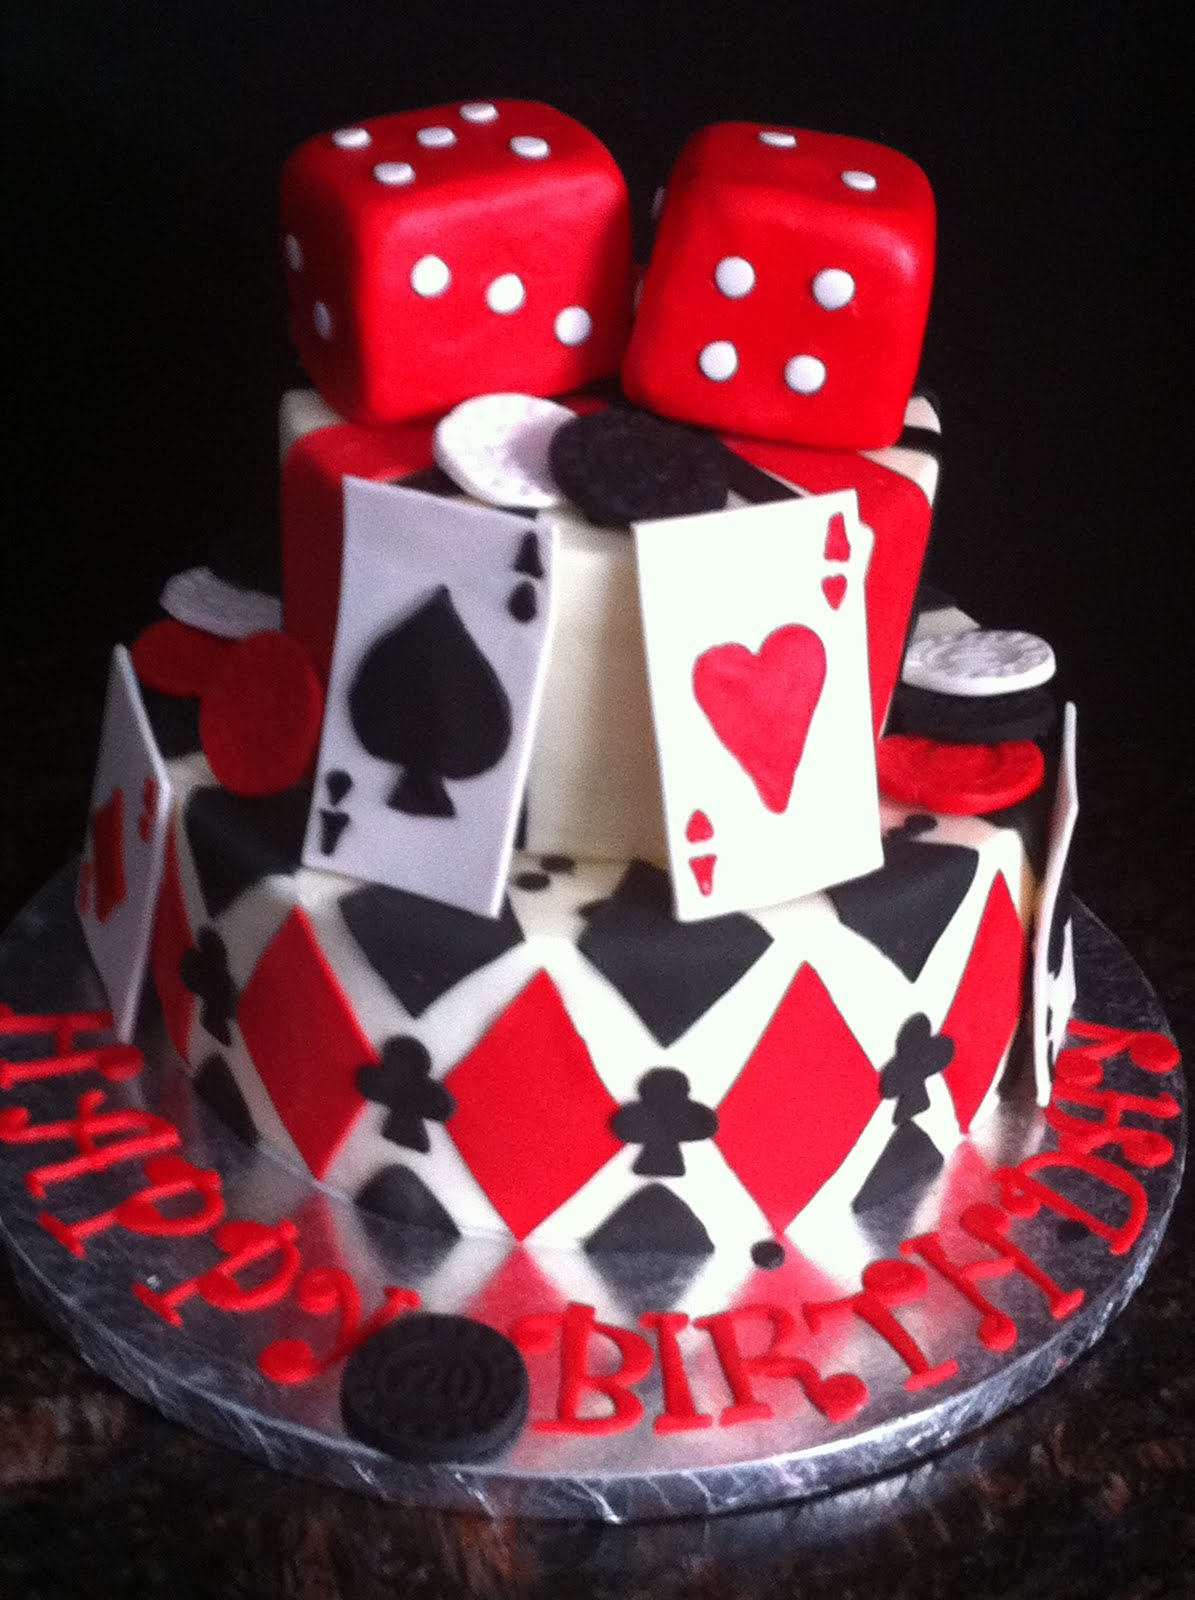 Casino Theme Party Cake